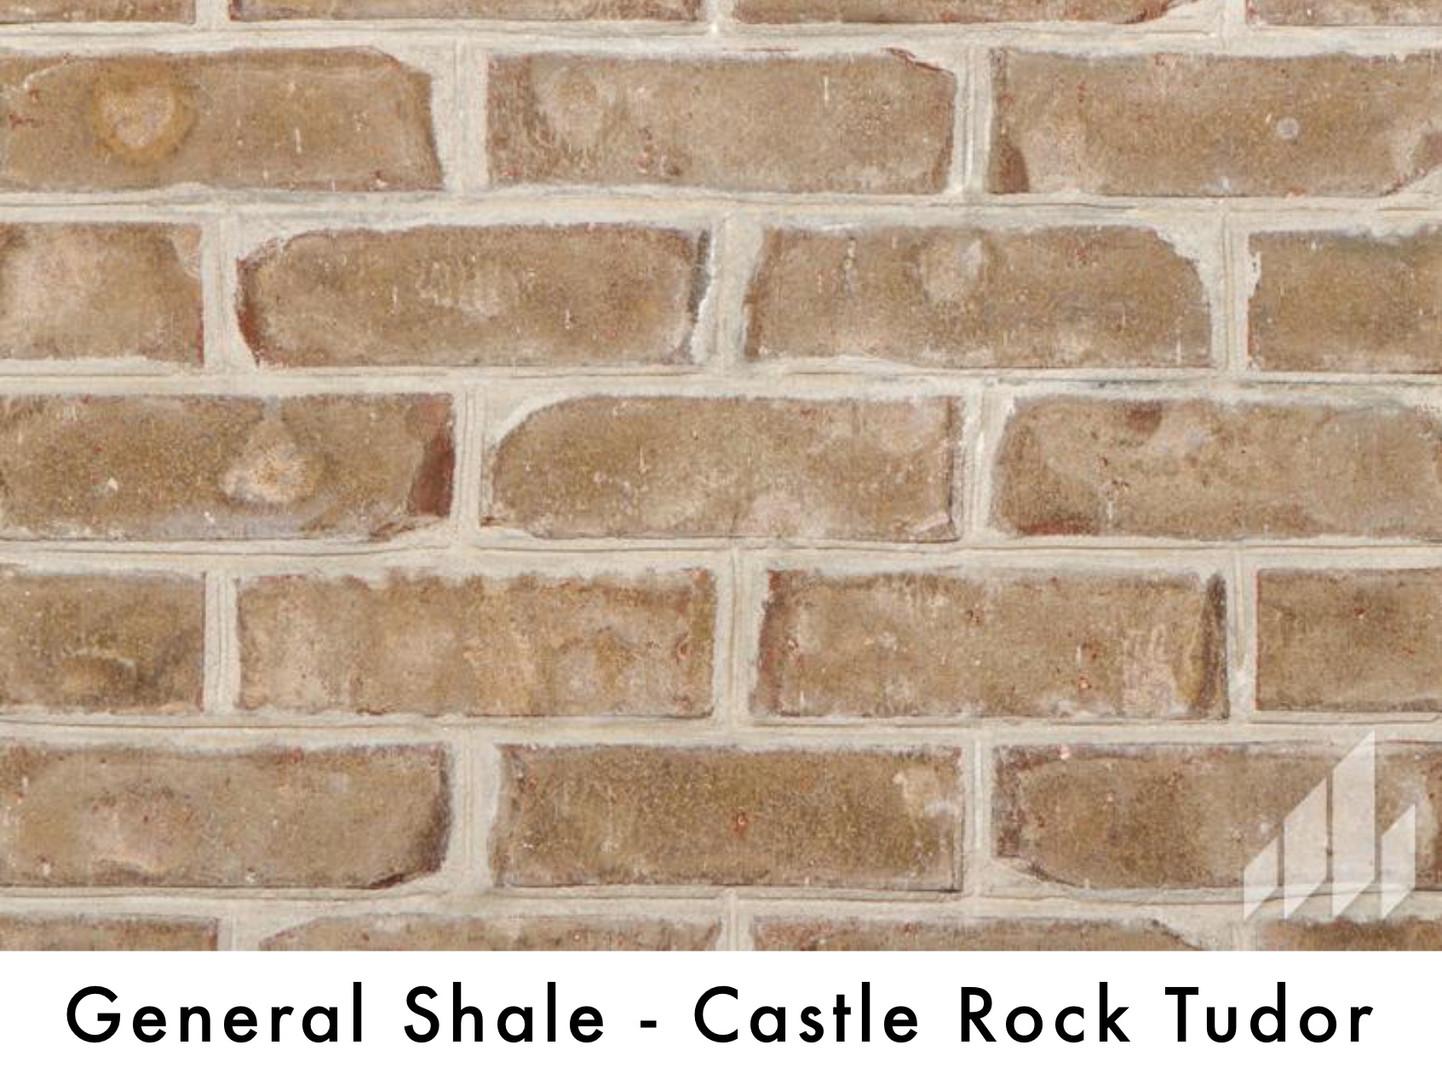 General Shale - Castle Rock Tudor